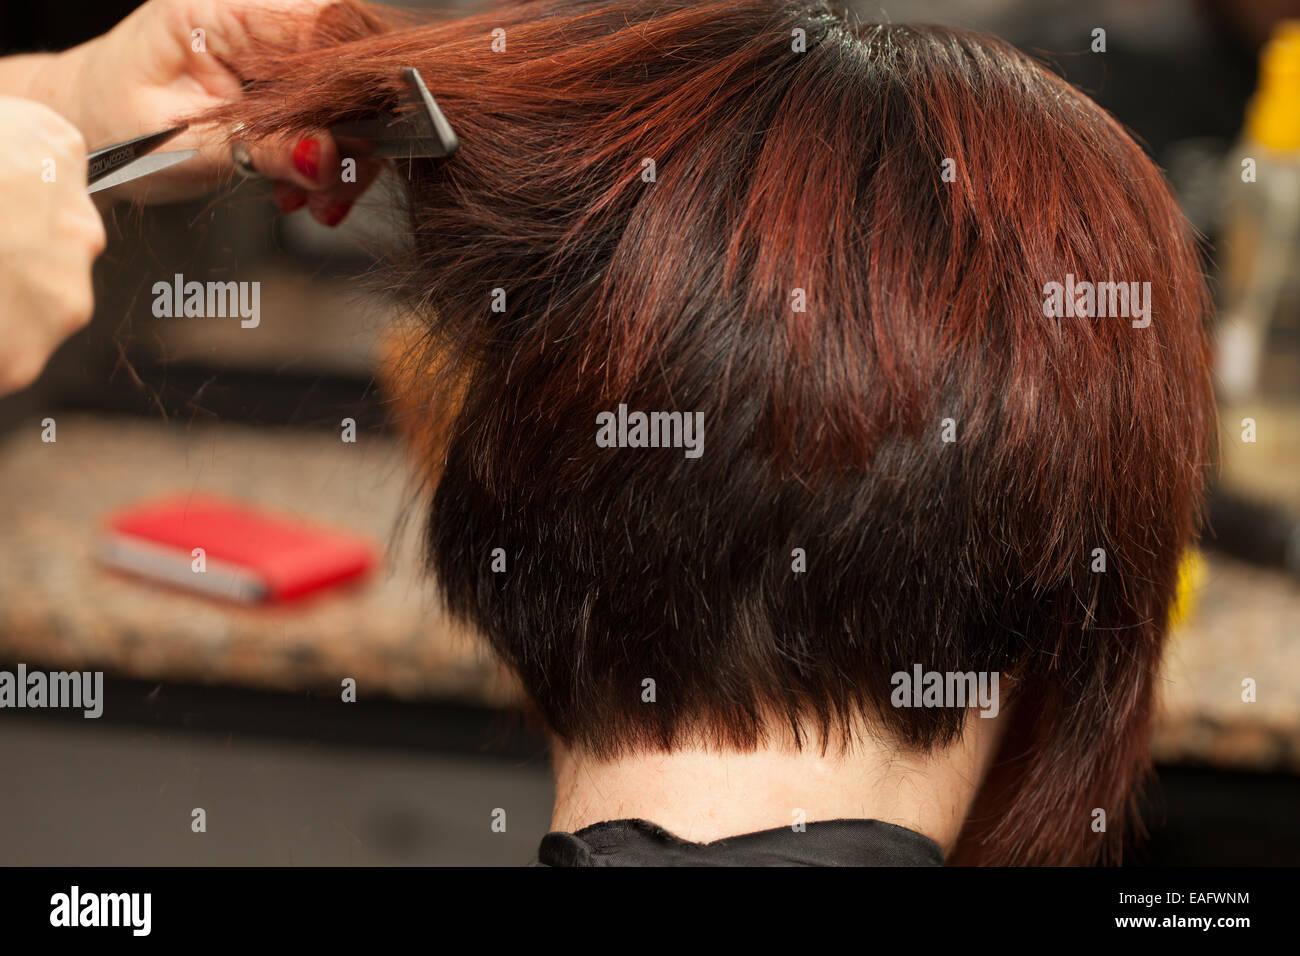 Hair Cut Closeup View - Stock Image